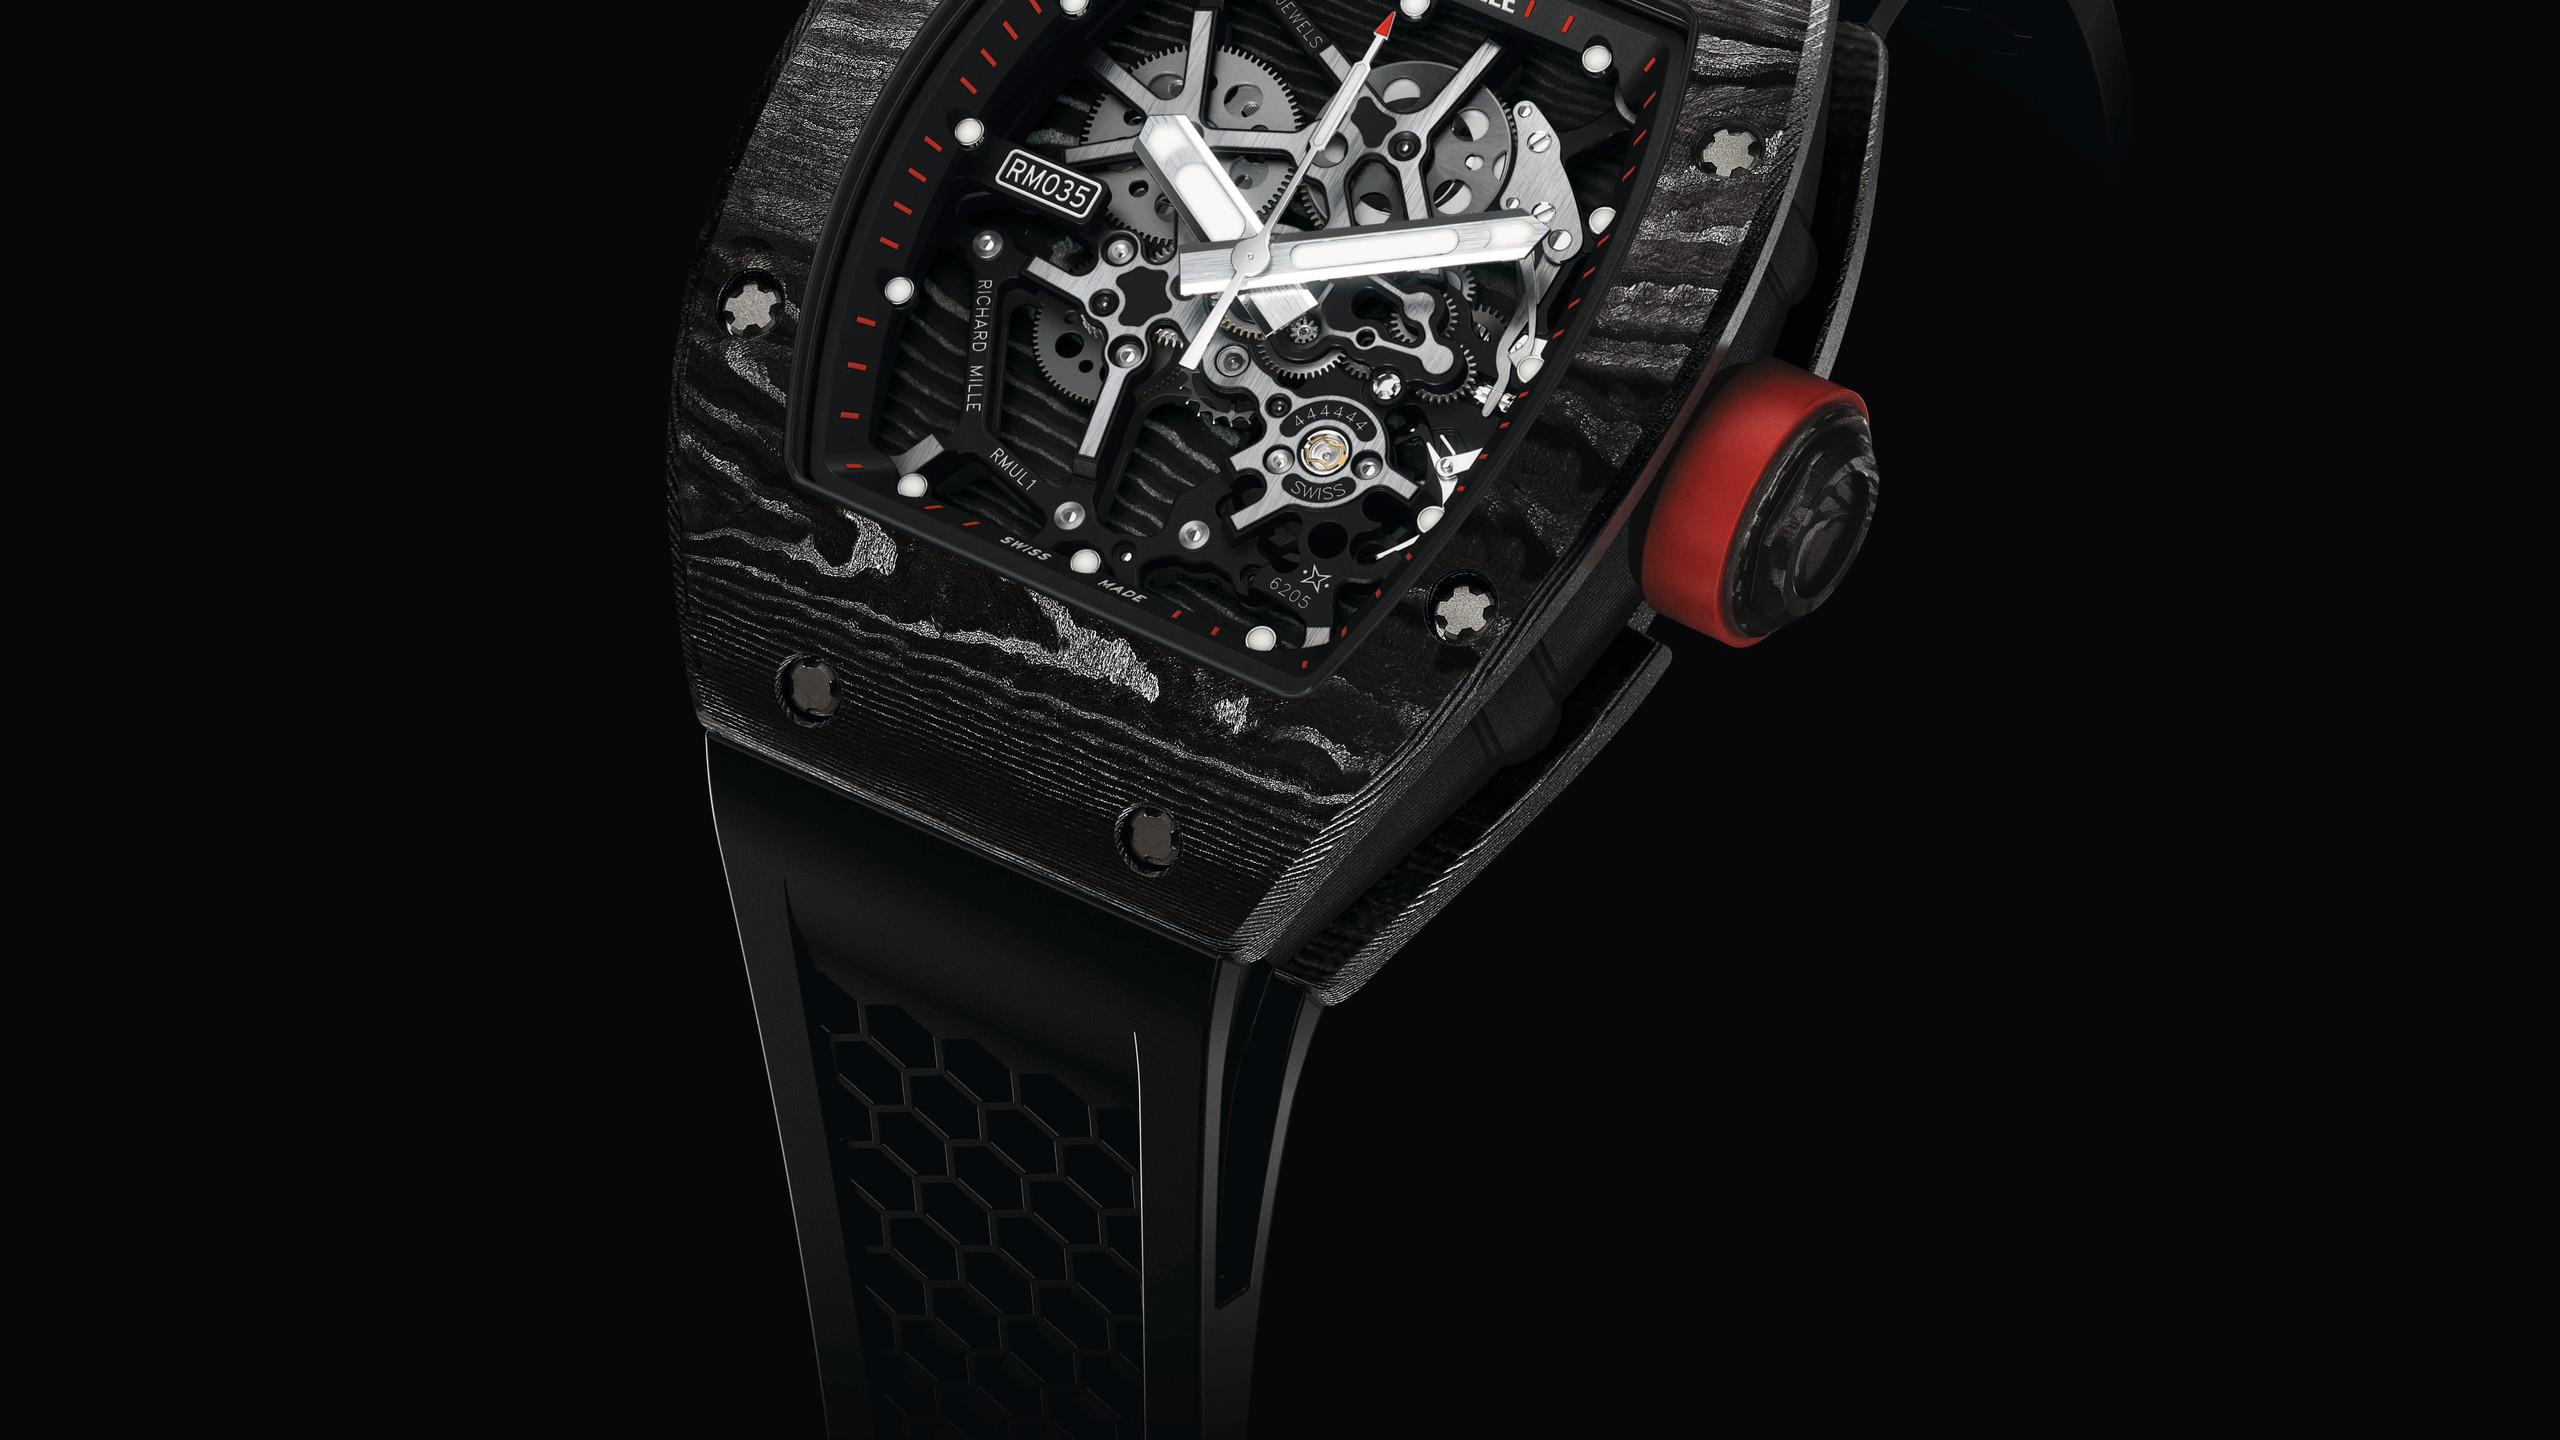 RICHARD MILLE RM 035 Ultimate Edition 48x39.7x12.25毫米TPT™碳纖維錶殼∕時分秒指示∕手動上鍊機芯∕動力儲存55小時∕限量35枚∕Chronofiable®認証